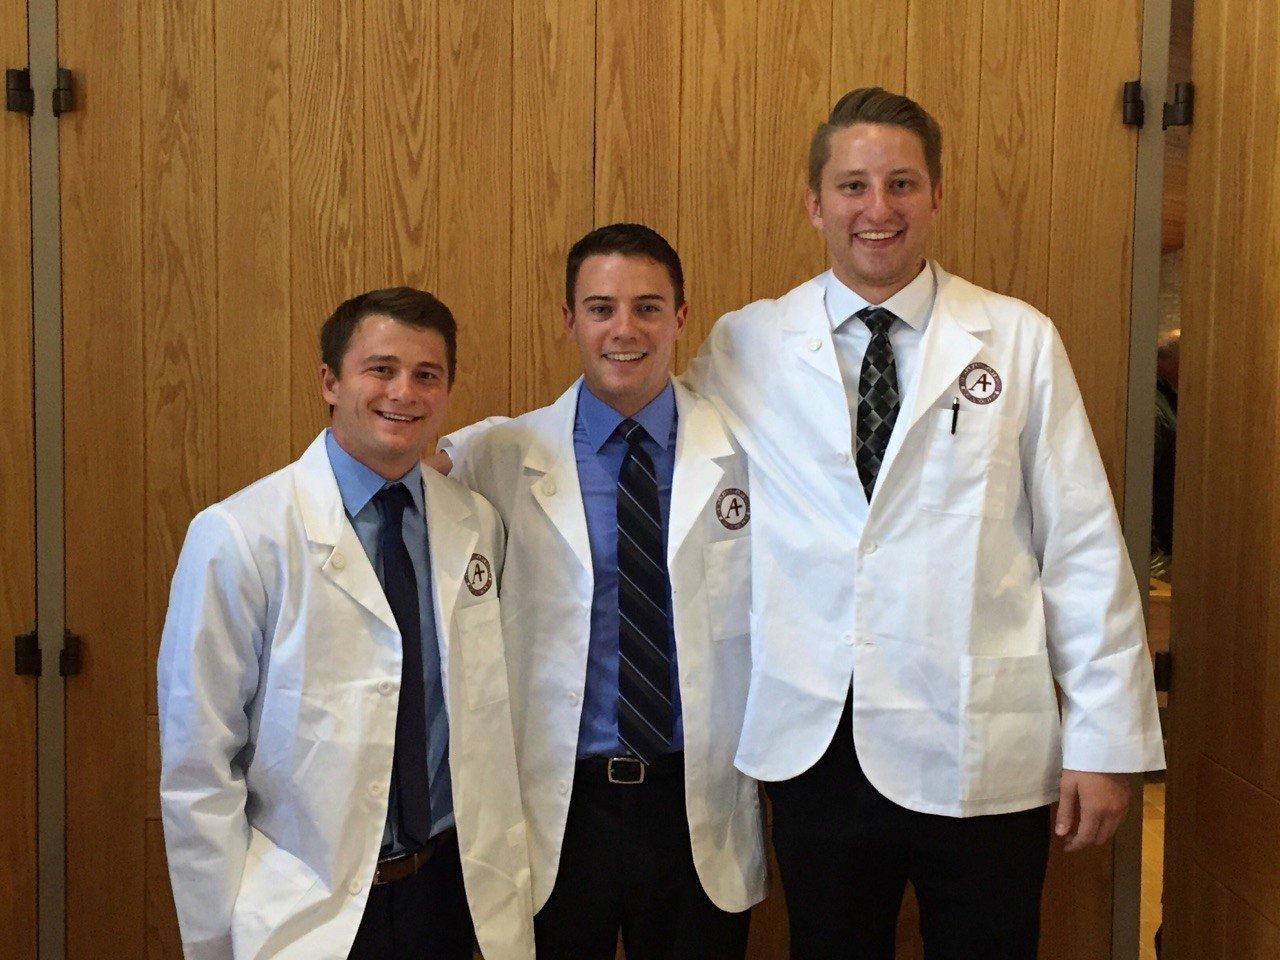 Uw Madison Letter Of Recommendation Elegant Matt Cyr Augsburg Physician assistant Class Of 2018